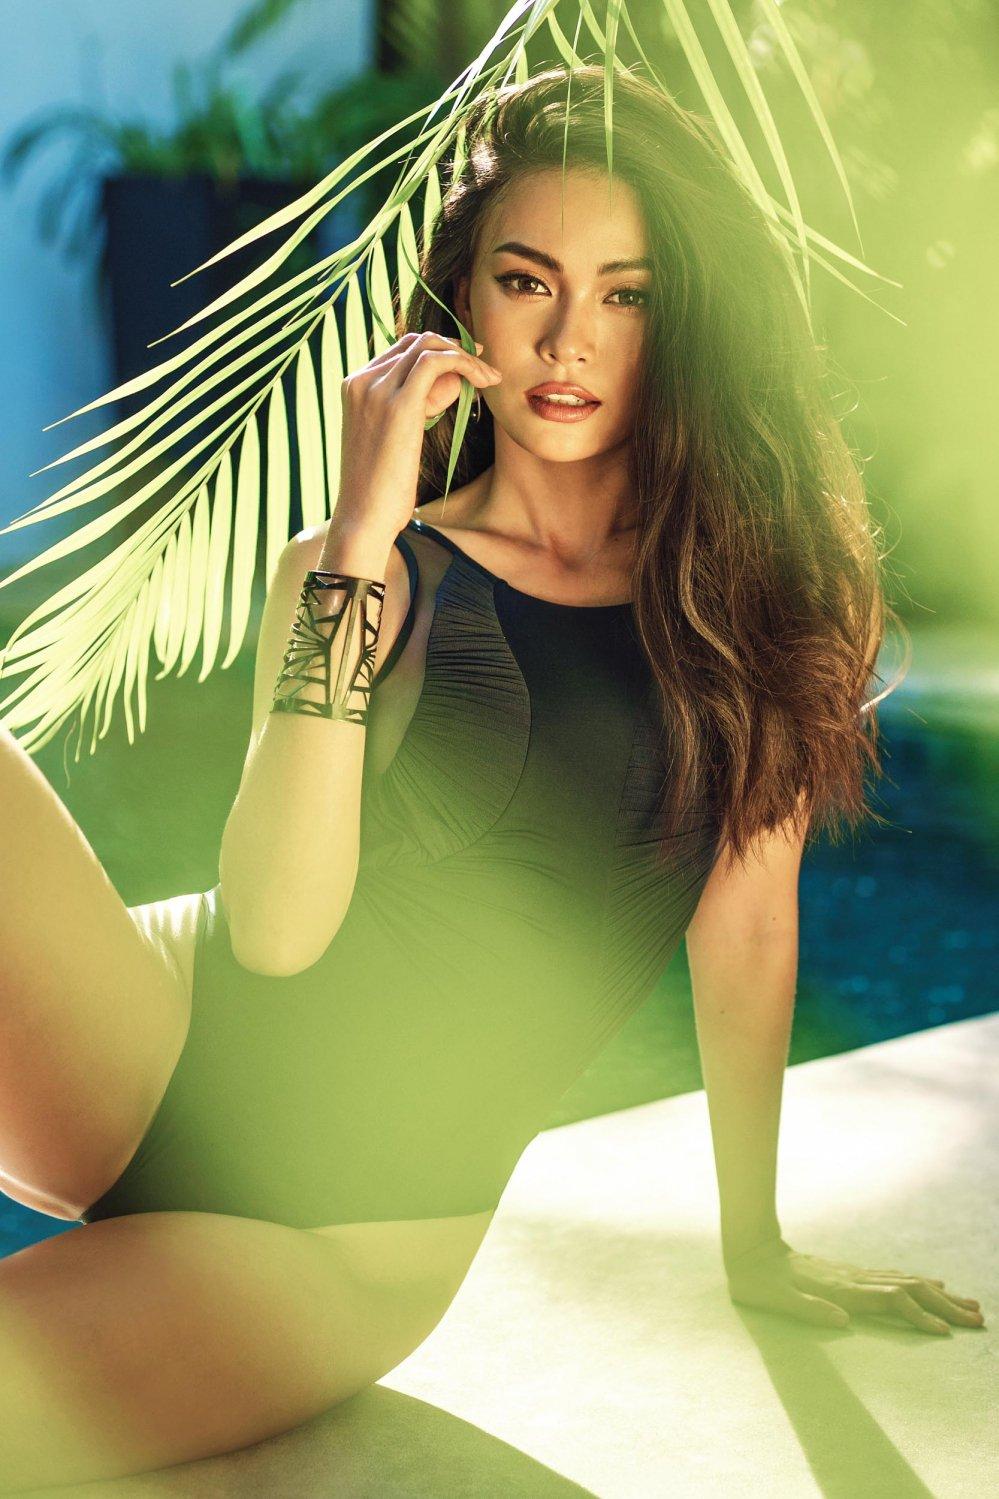 Quan quan Next Top Model 2013 nong bong dien bikini don he hinh anh 5